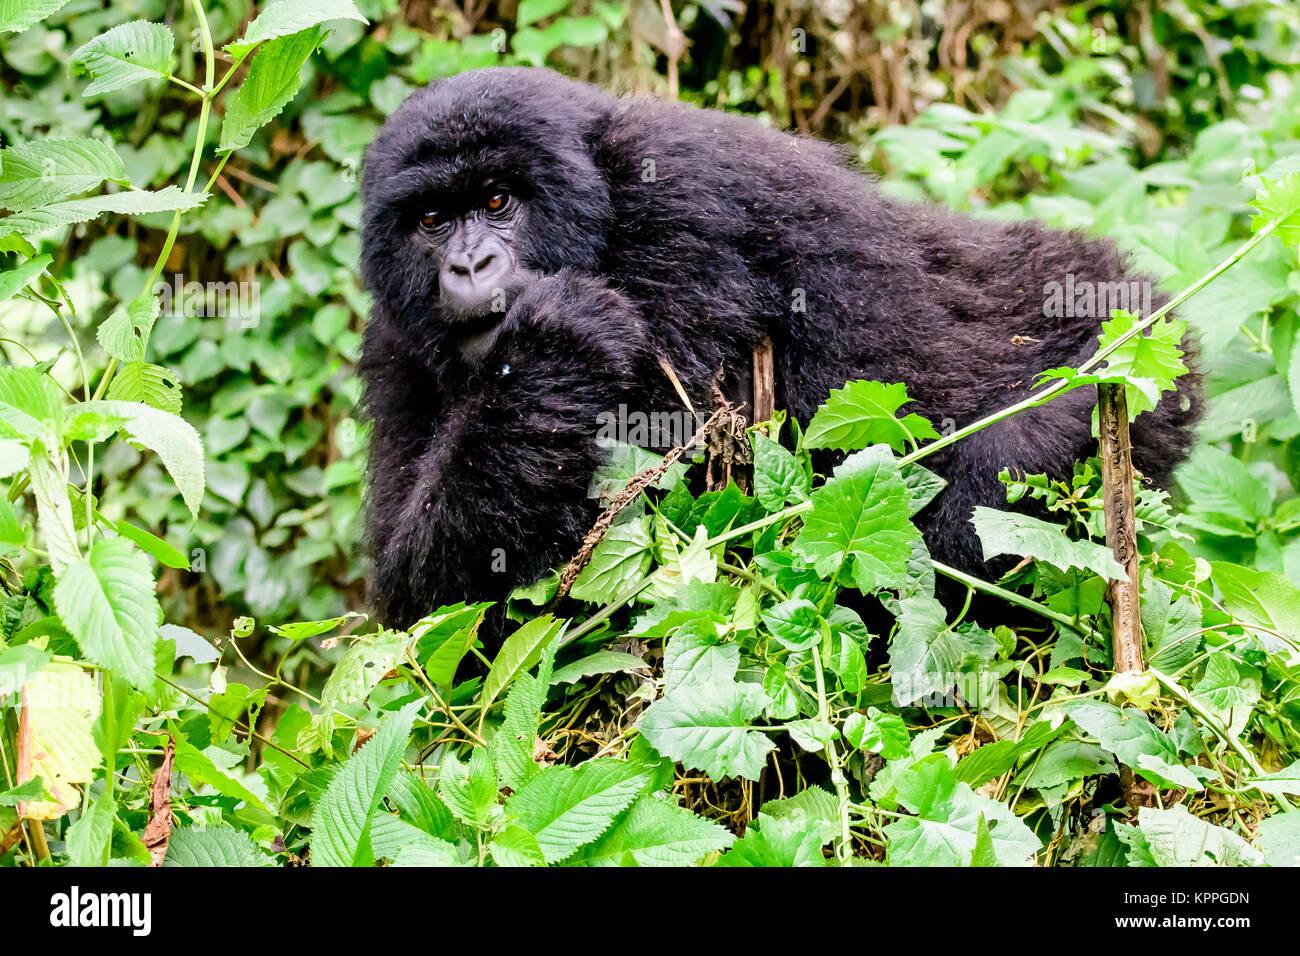 Mountain gorilla peering - Stock Image